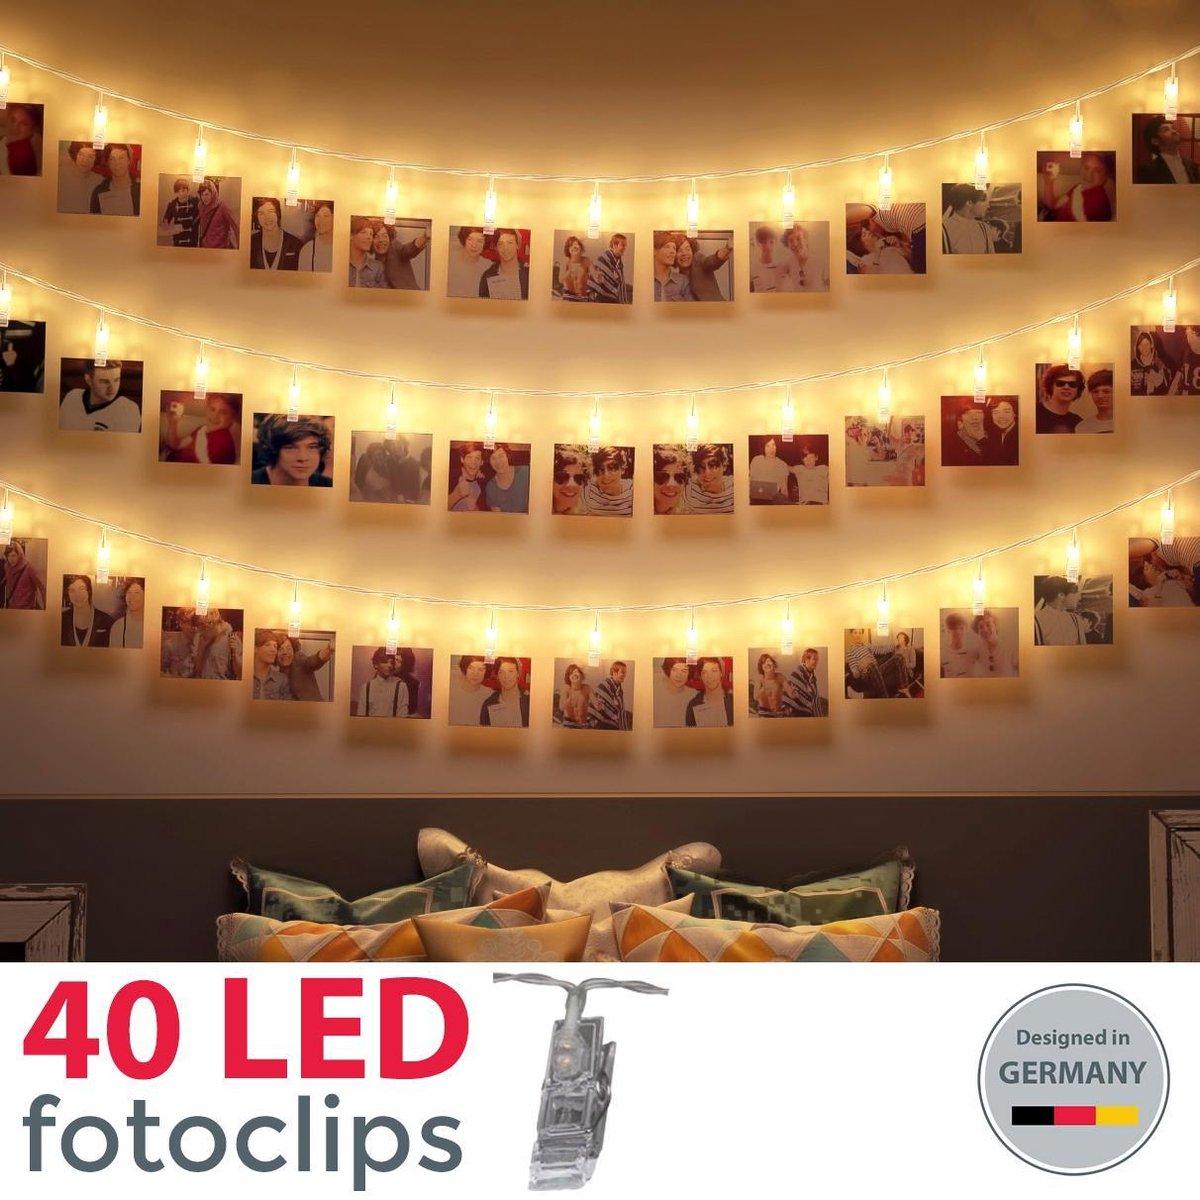 B.K.Licht - Foto lichtsnoer - lichtslinger - verlichting - 40 LED - fotoclips - l: 5m - op batterije